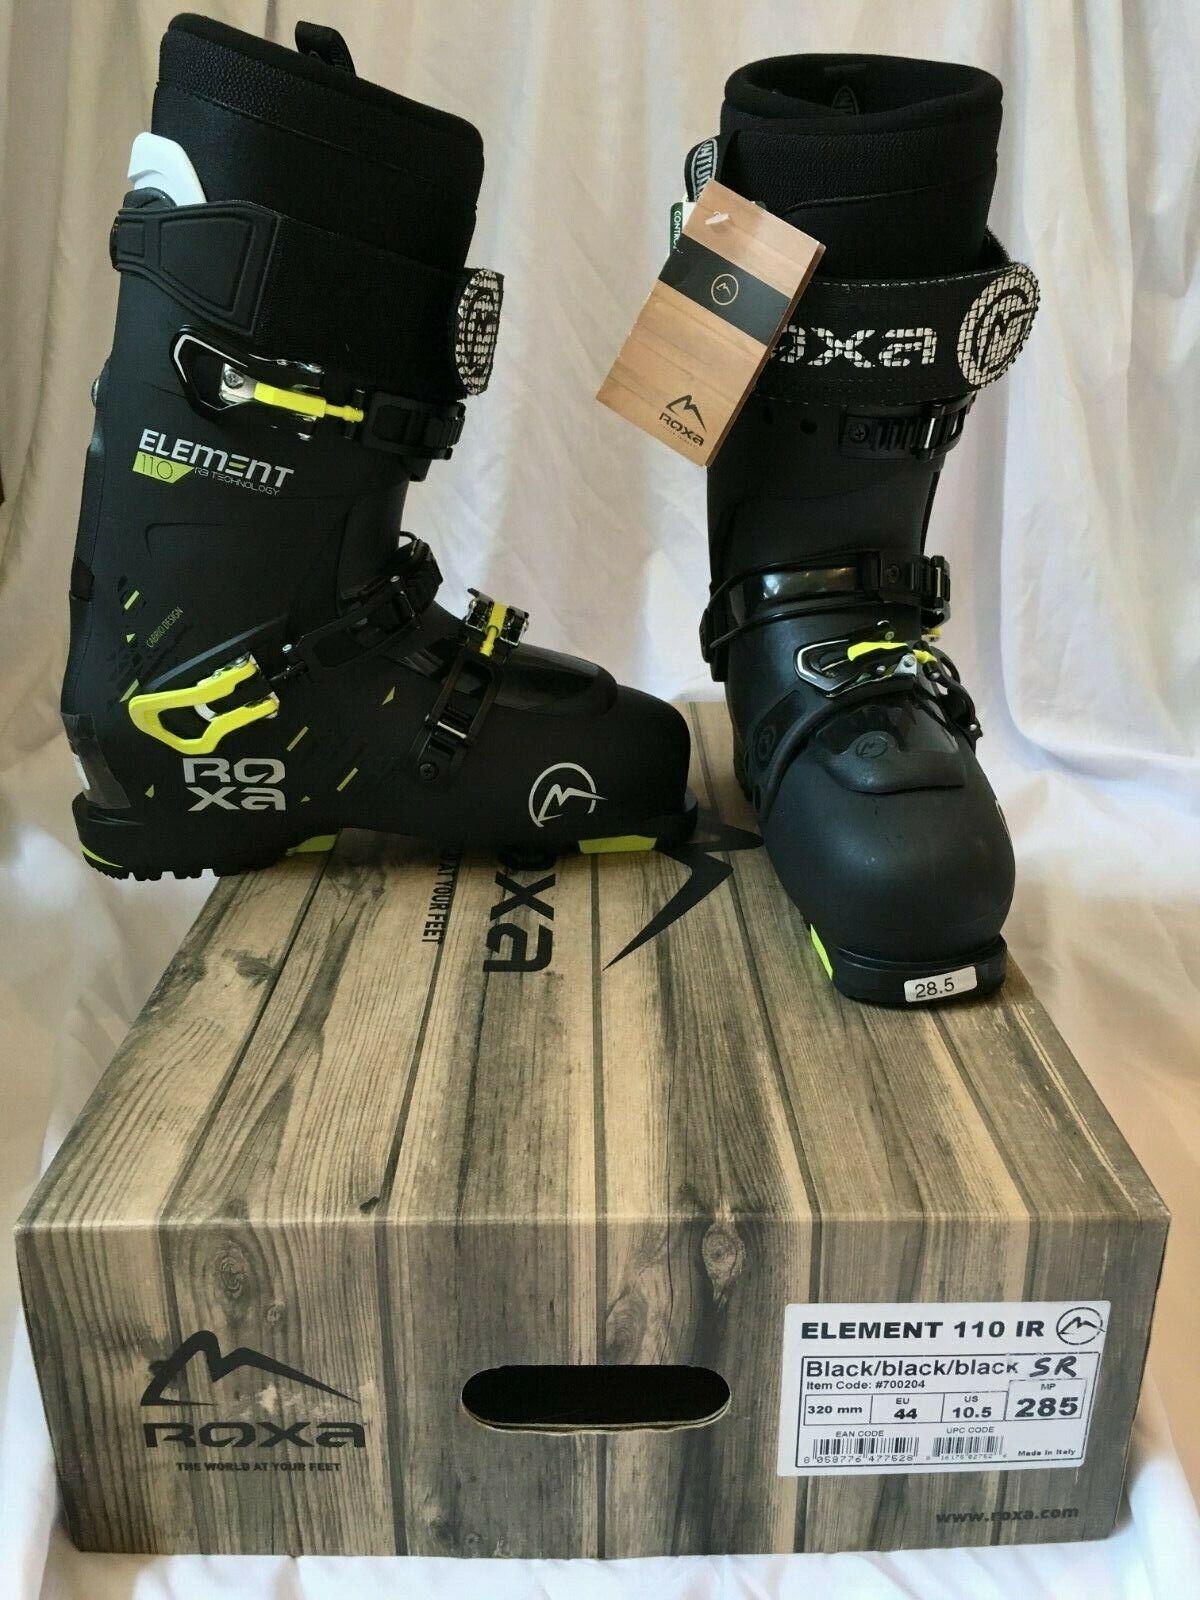 NEW  Roxa Element 110 IR Men's Ski Boots Mondo Size 28.5  quality guaranteed